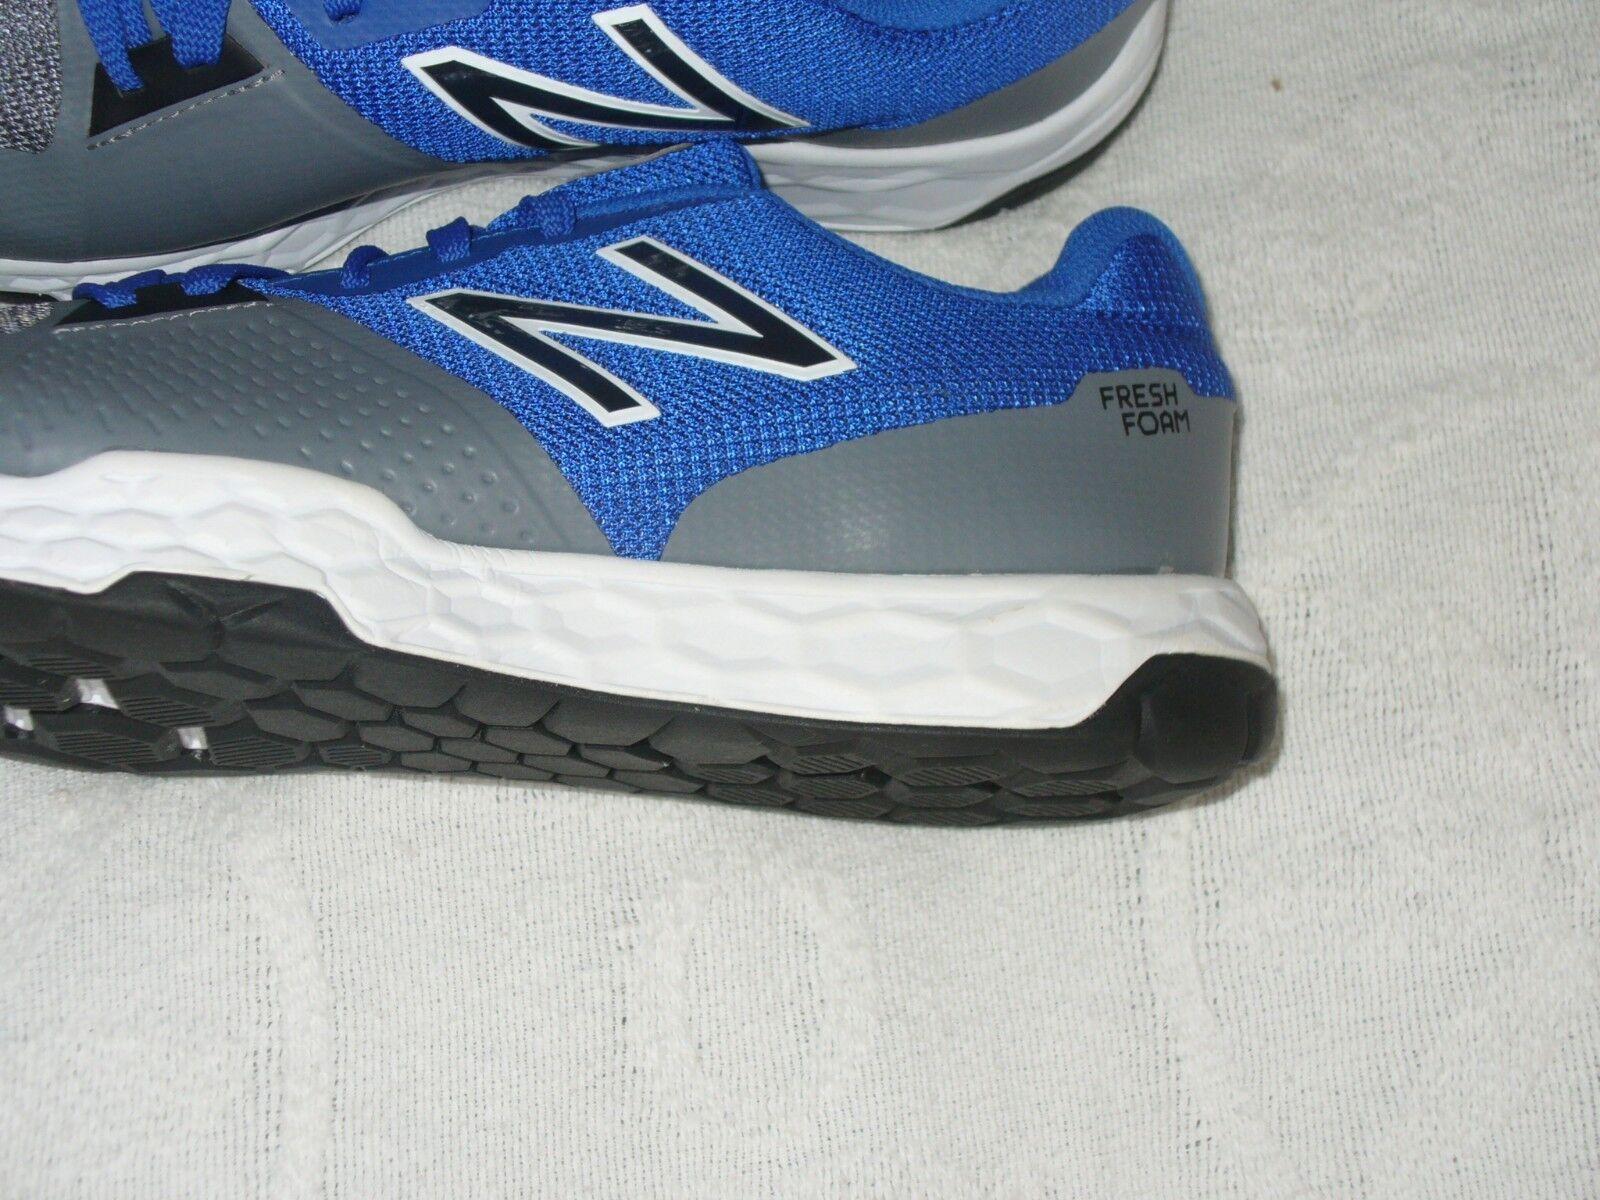 New Balance Men's 713v3 Fresh Fresh Fresh Foam bluee  Grey SIZE 11 4E   LOOK  BRAND NEW. 1f004c